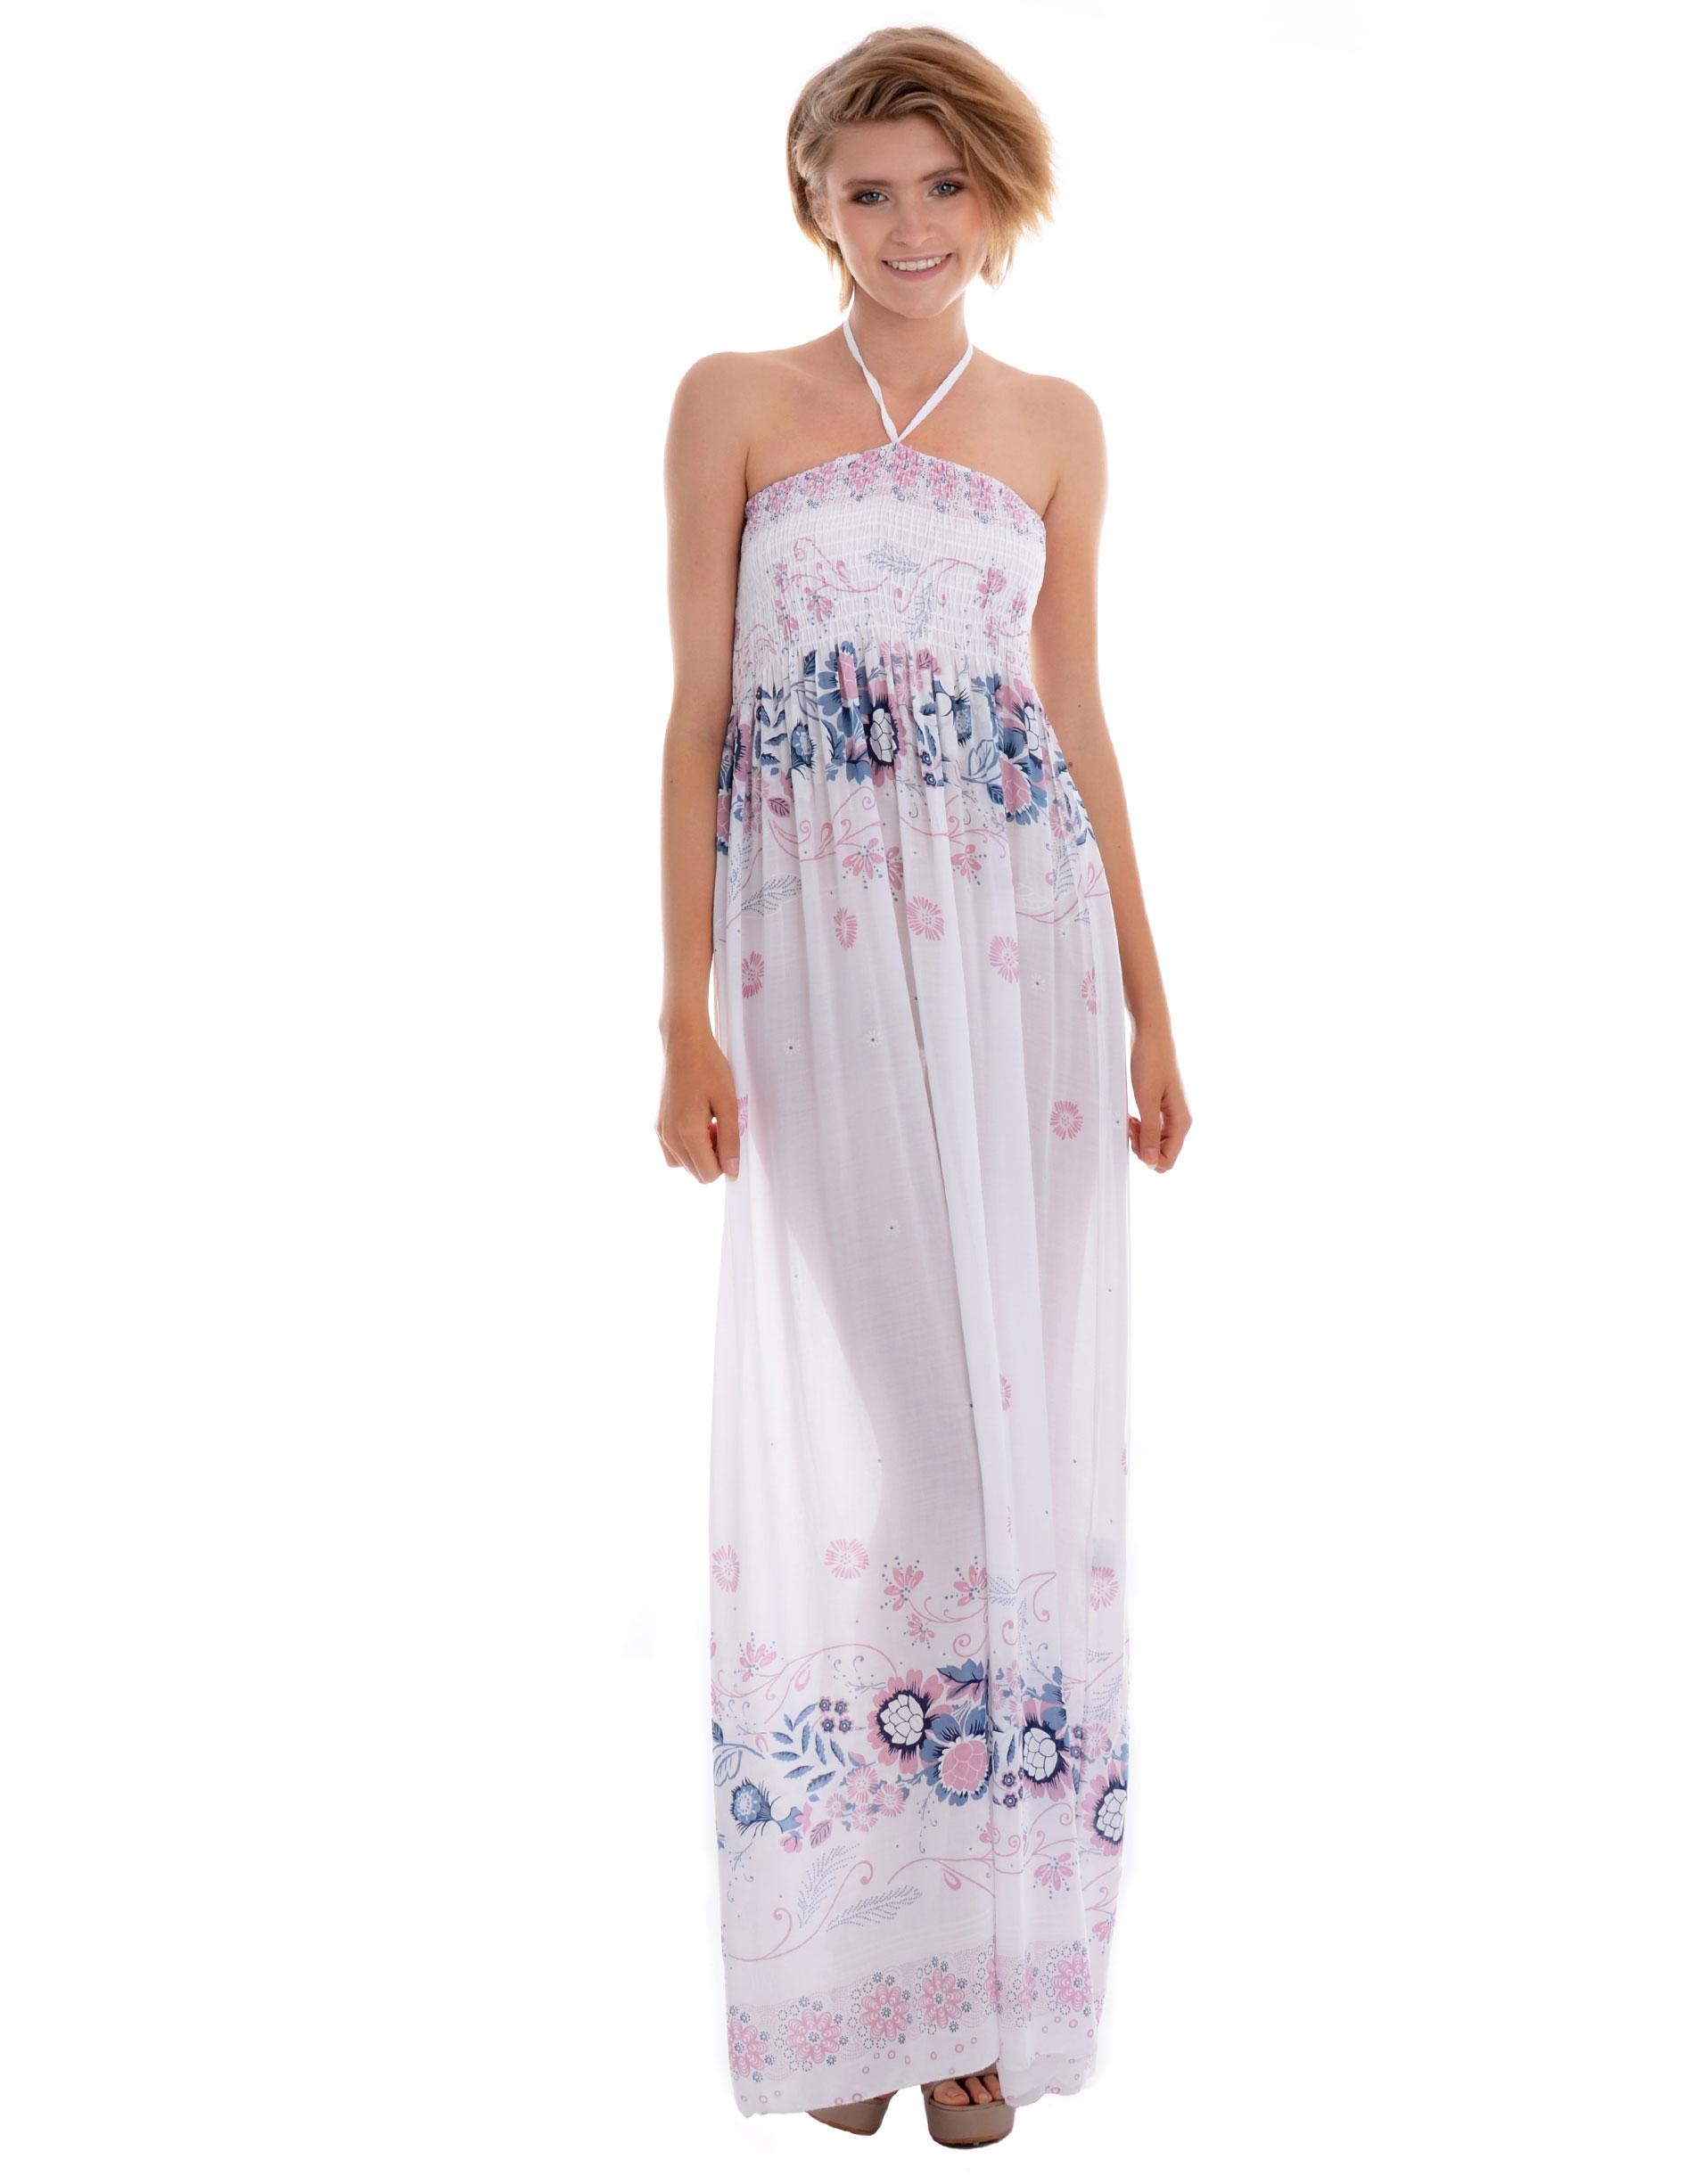 Sukienka - 20-8125D BIAN - Unisono